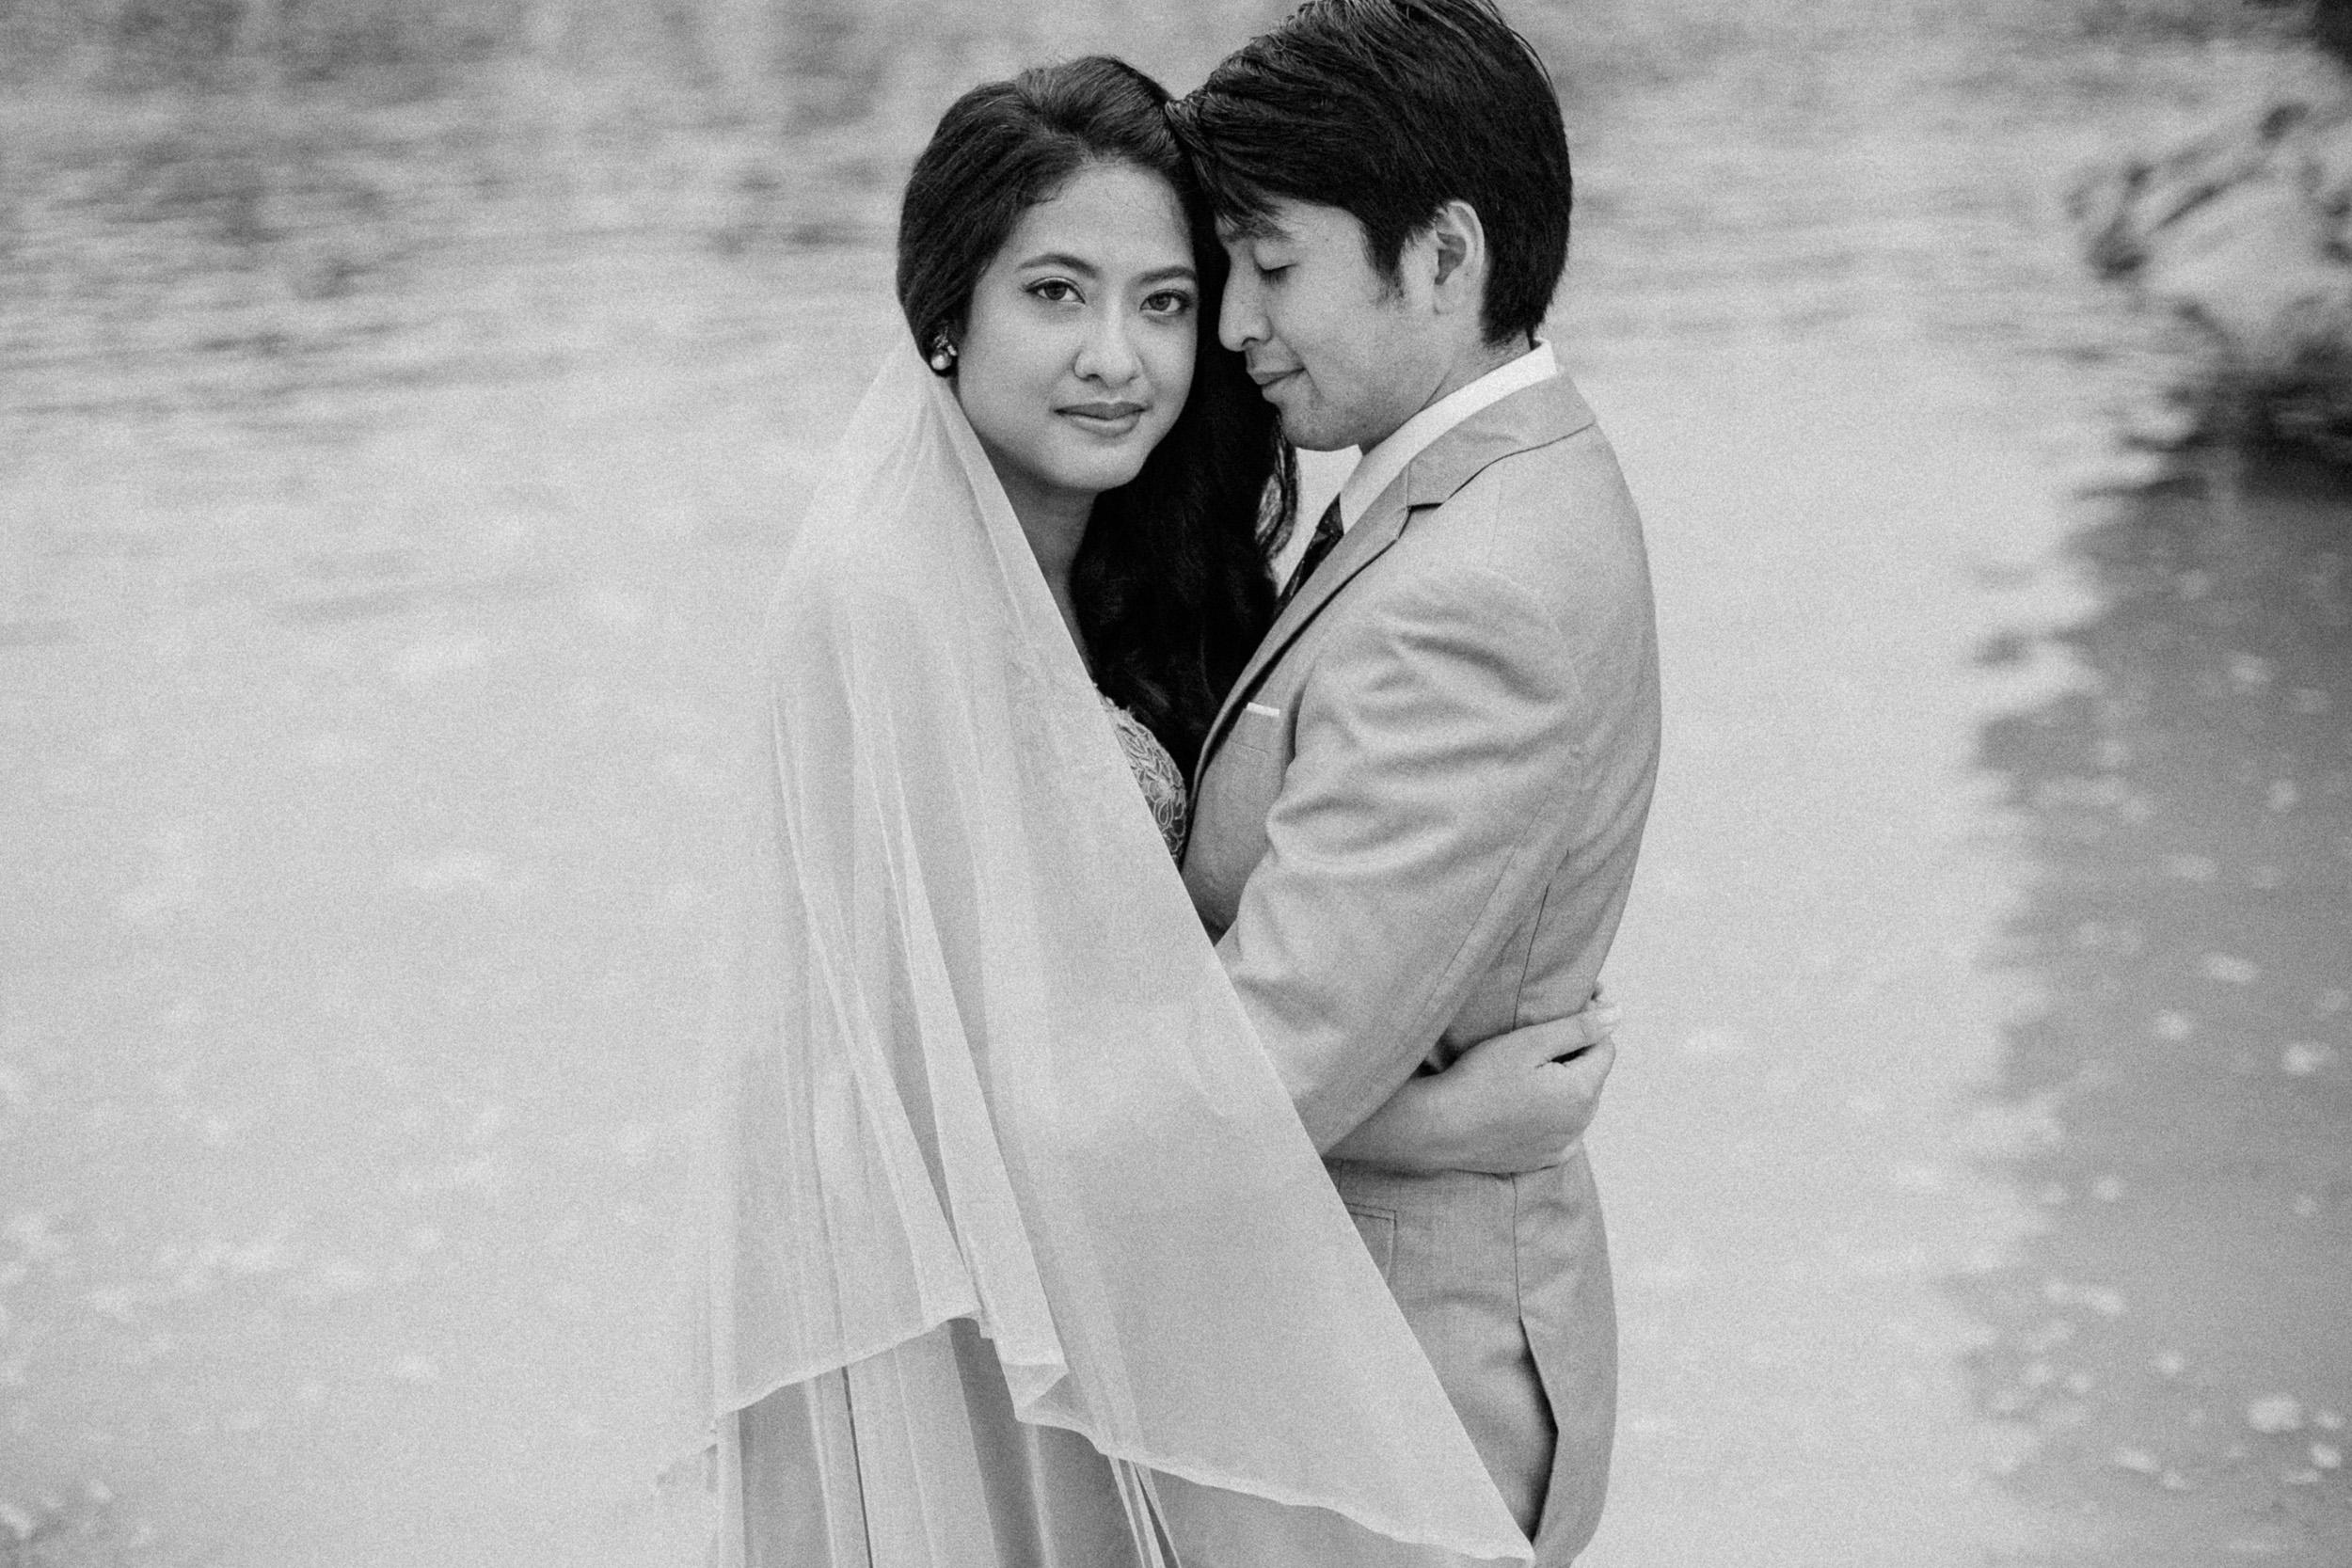 singapore-wedding-photographer-photography-wmt2017-021.jpg